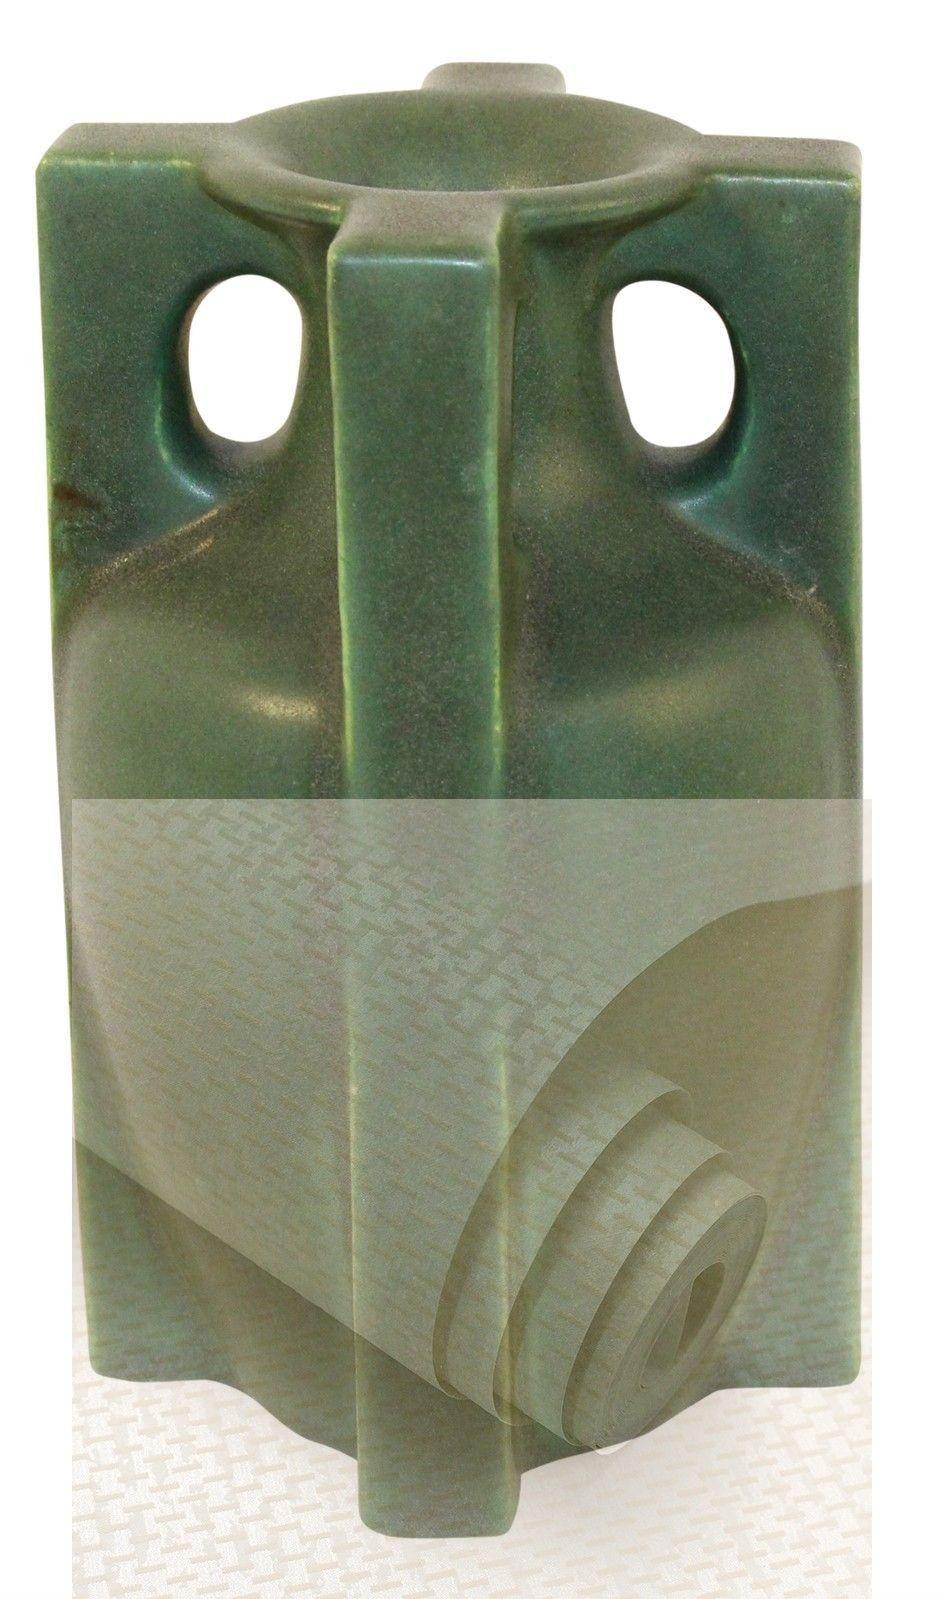 Idee Deco Vase Rond 17+ divine round glass vases ideas | vase shapes, vase